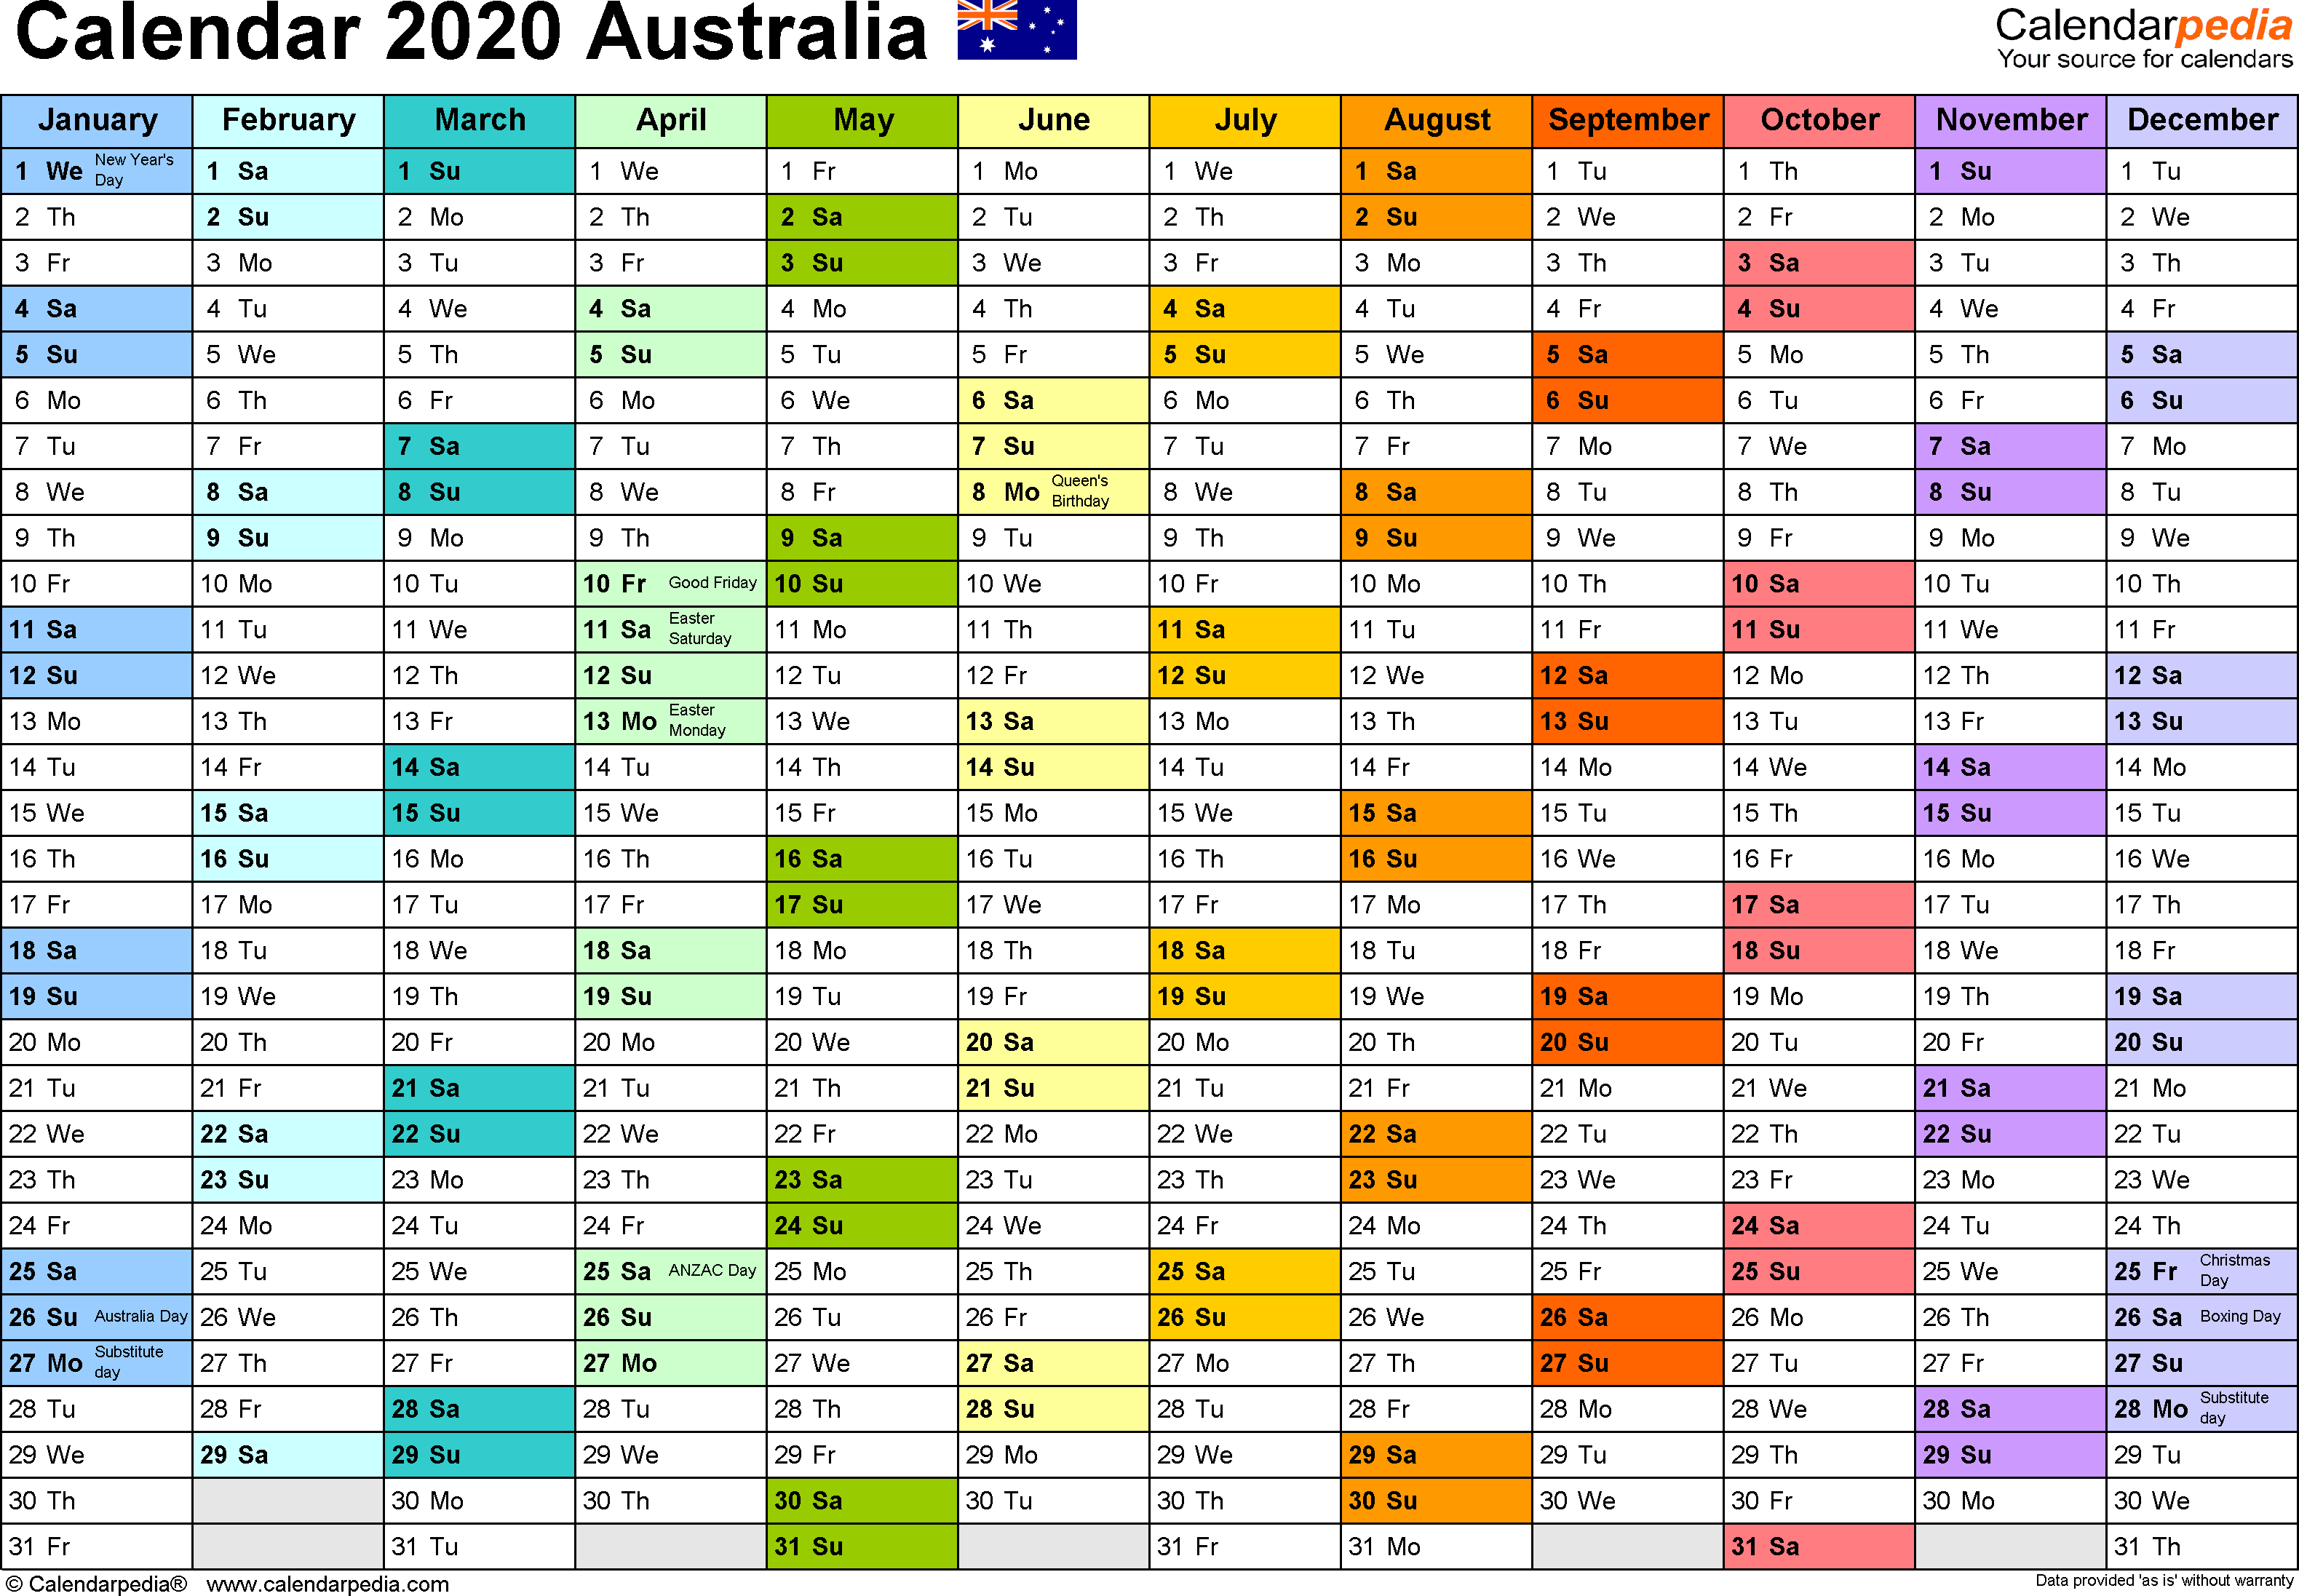 Australia Calendar 2020 - Free Printable Word Templates within Qld School Calendar 2020 Printable